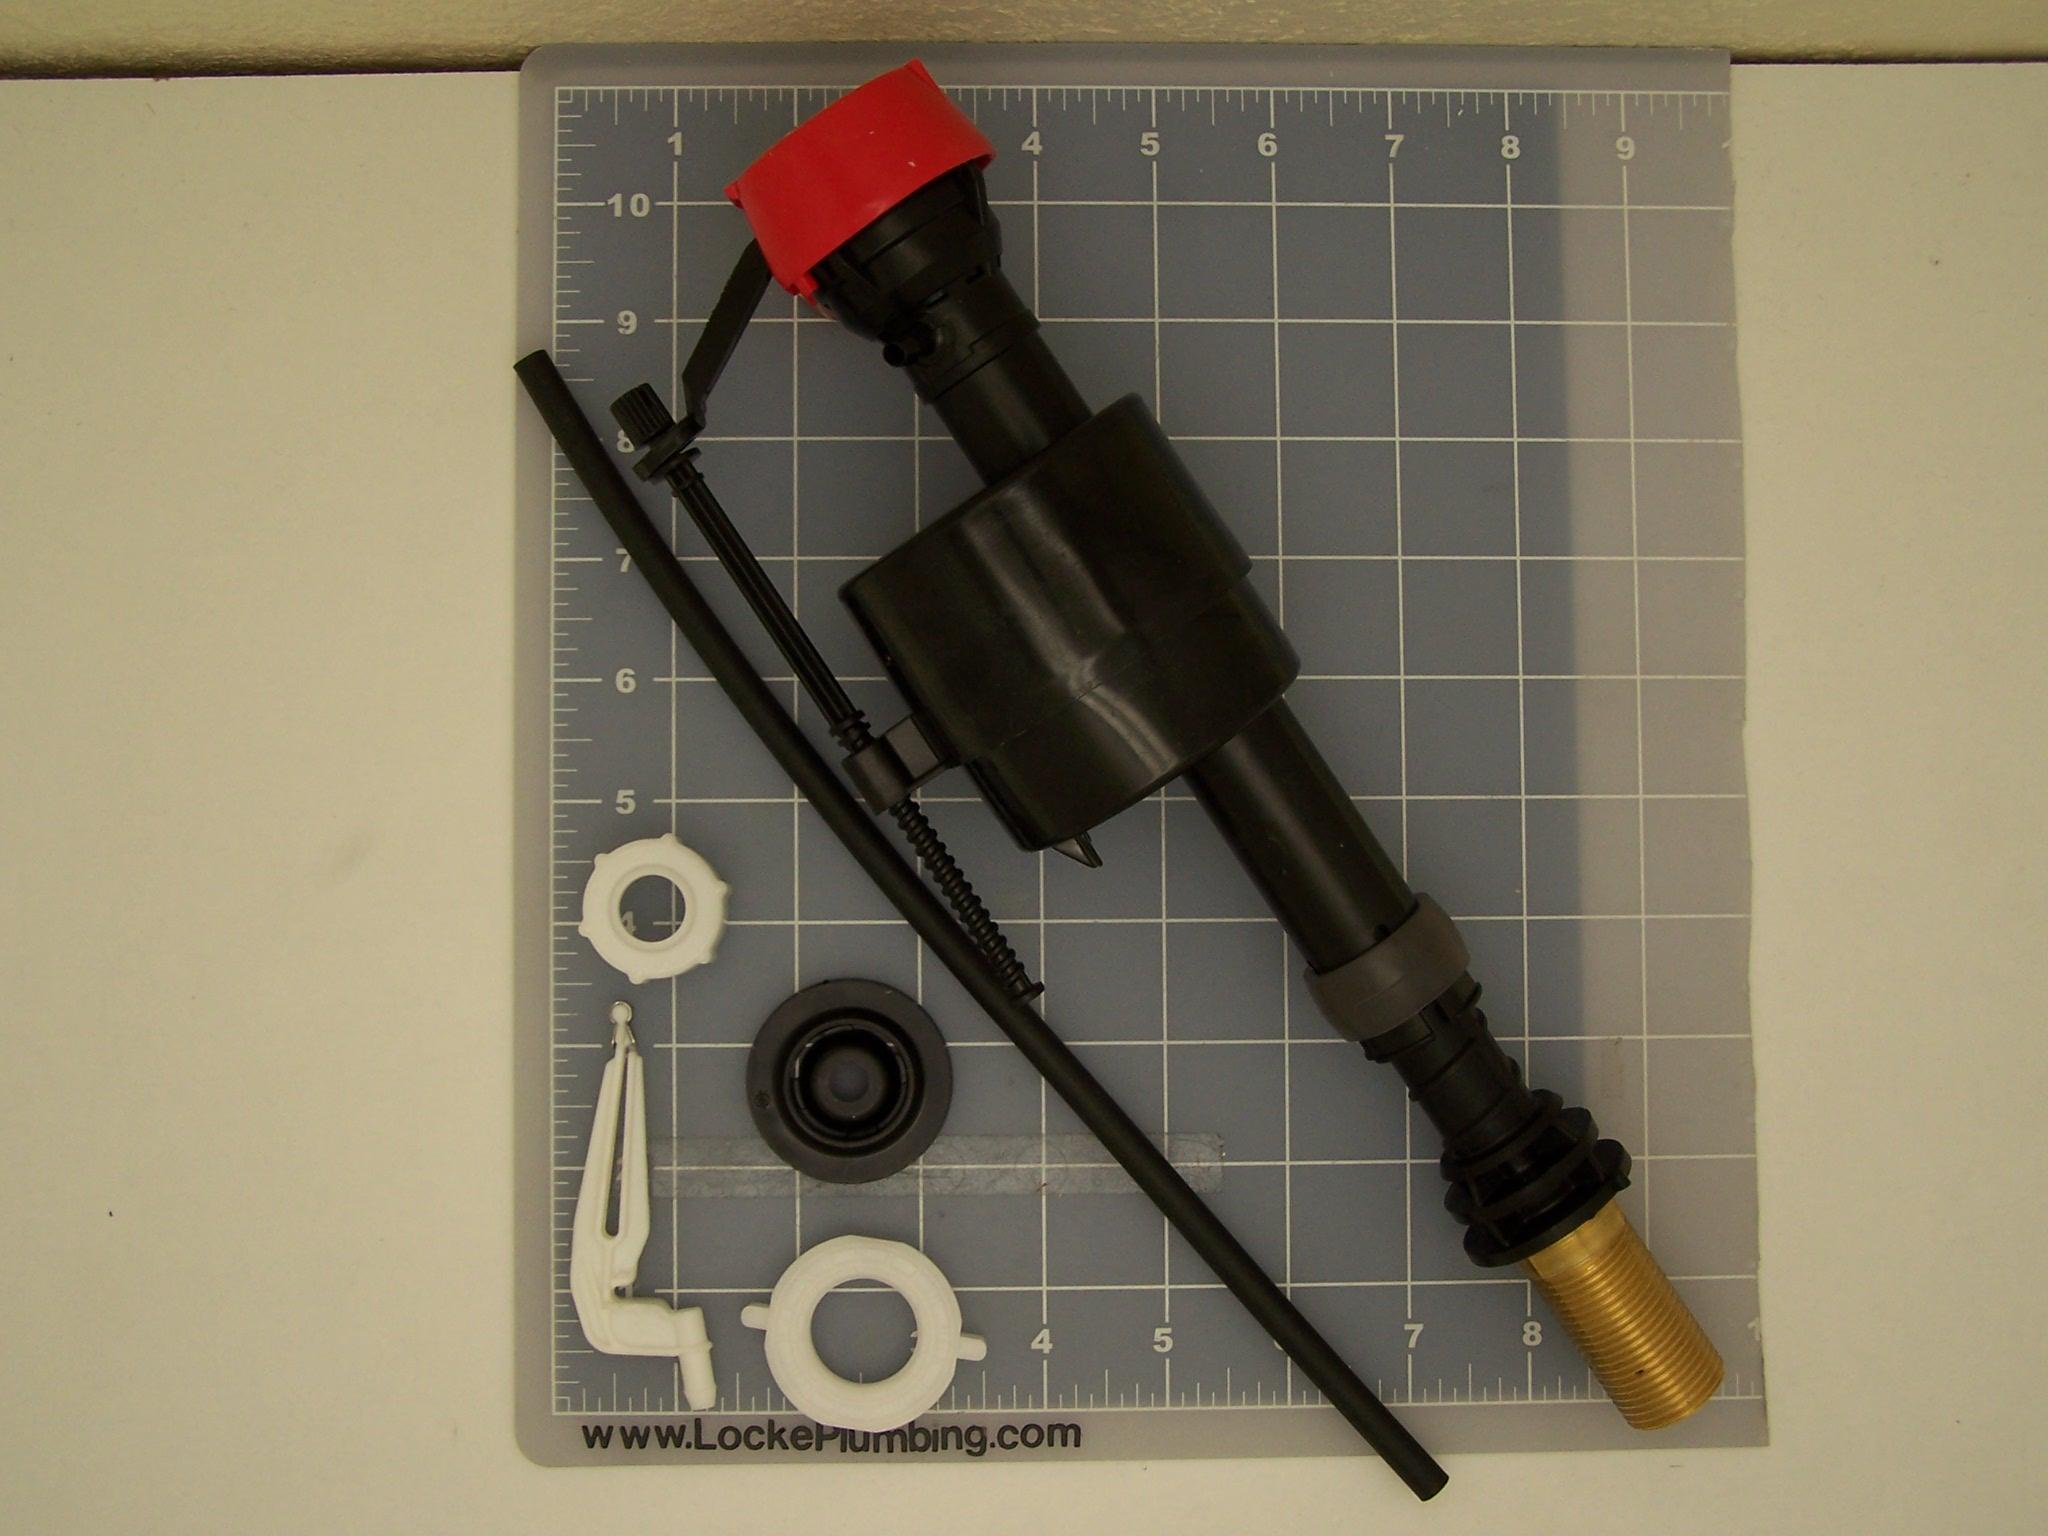 Fluidmaster FLU-PRO45B Fill Valve With Brass Shank - Locke Plumbing